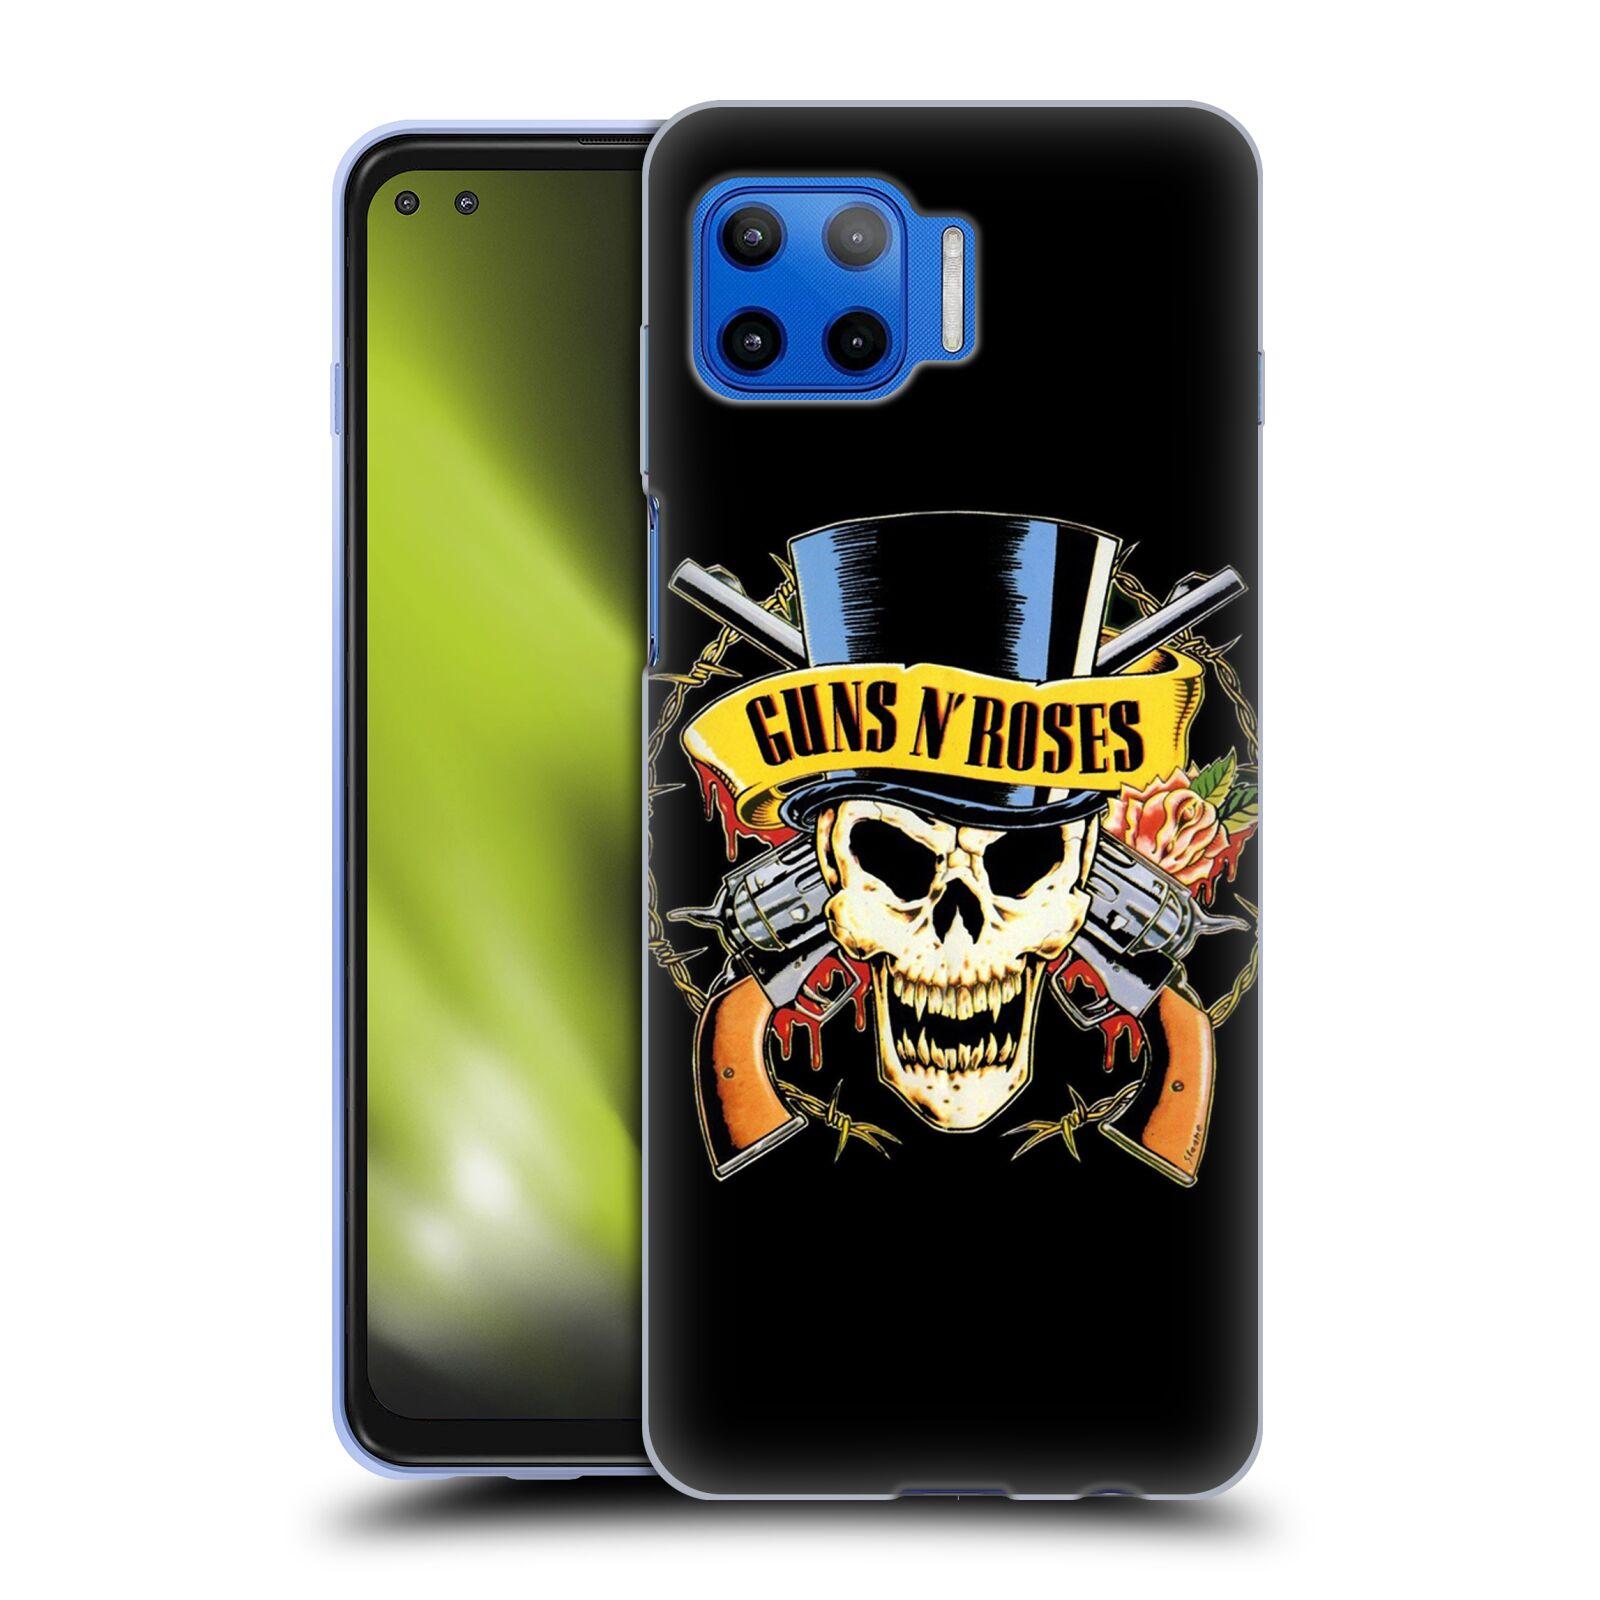 Silikonové pouzdro na mobil Motorola Moto G 5G Plus - Head Case - Guns N' Roses - Lebka